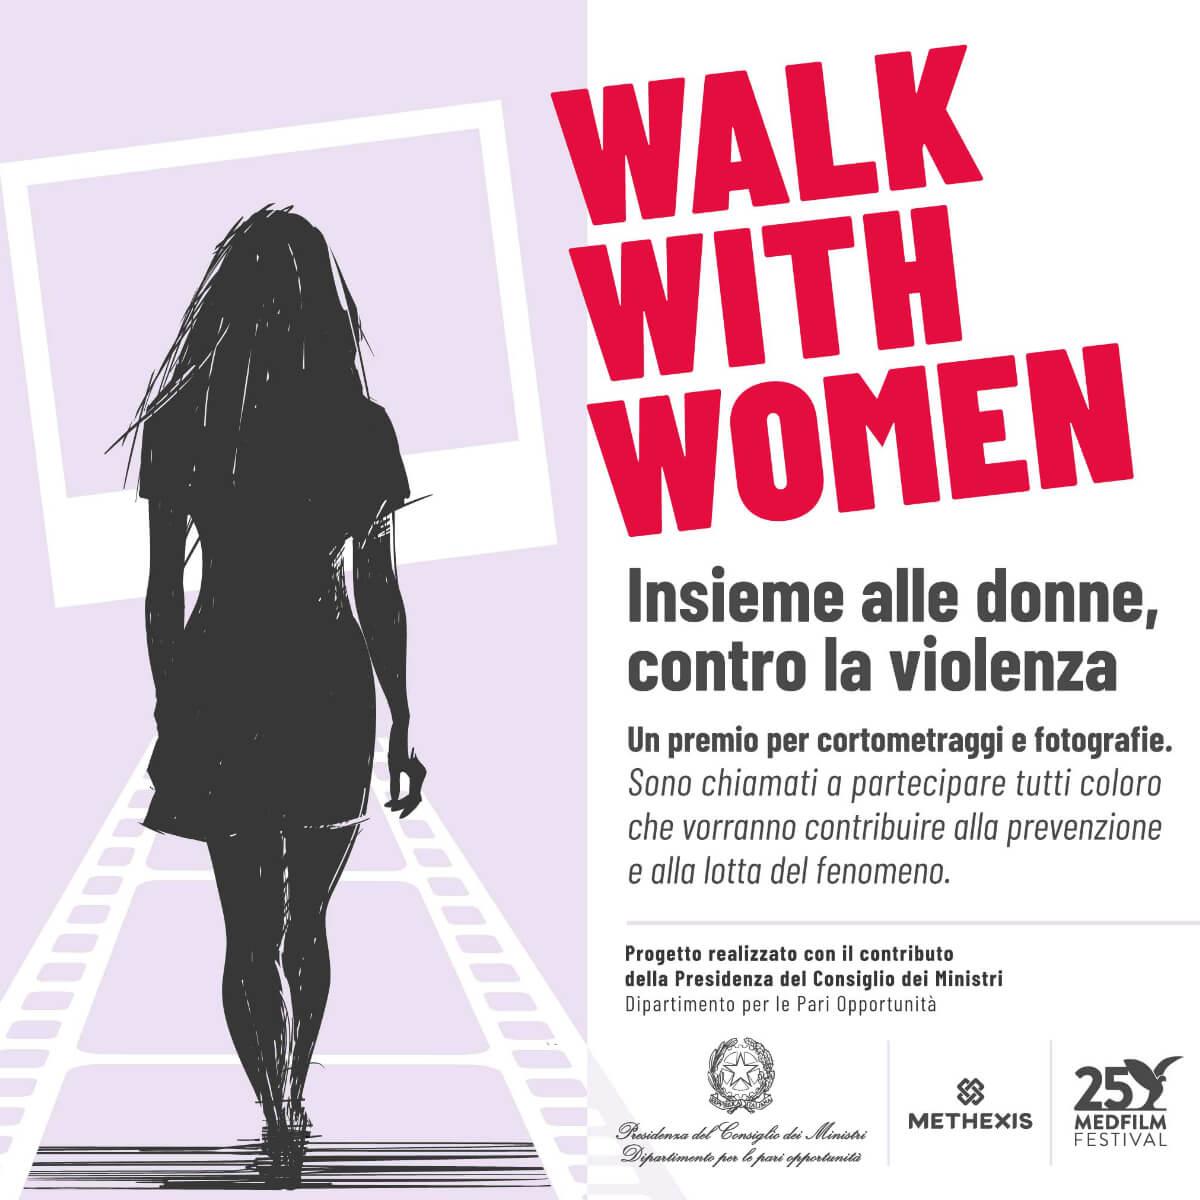 Walk with women